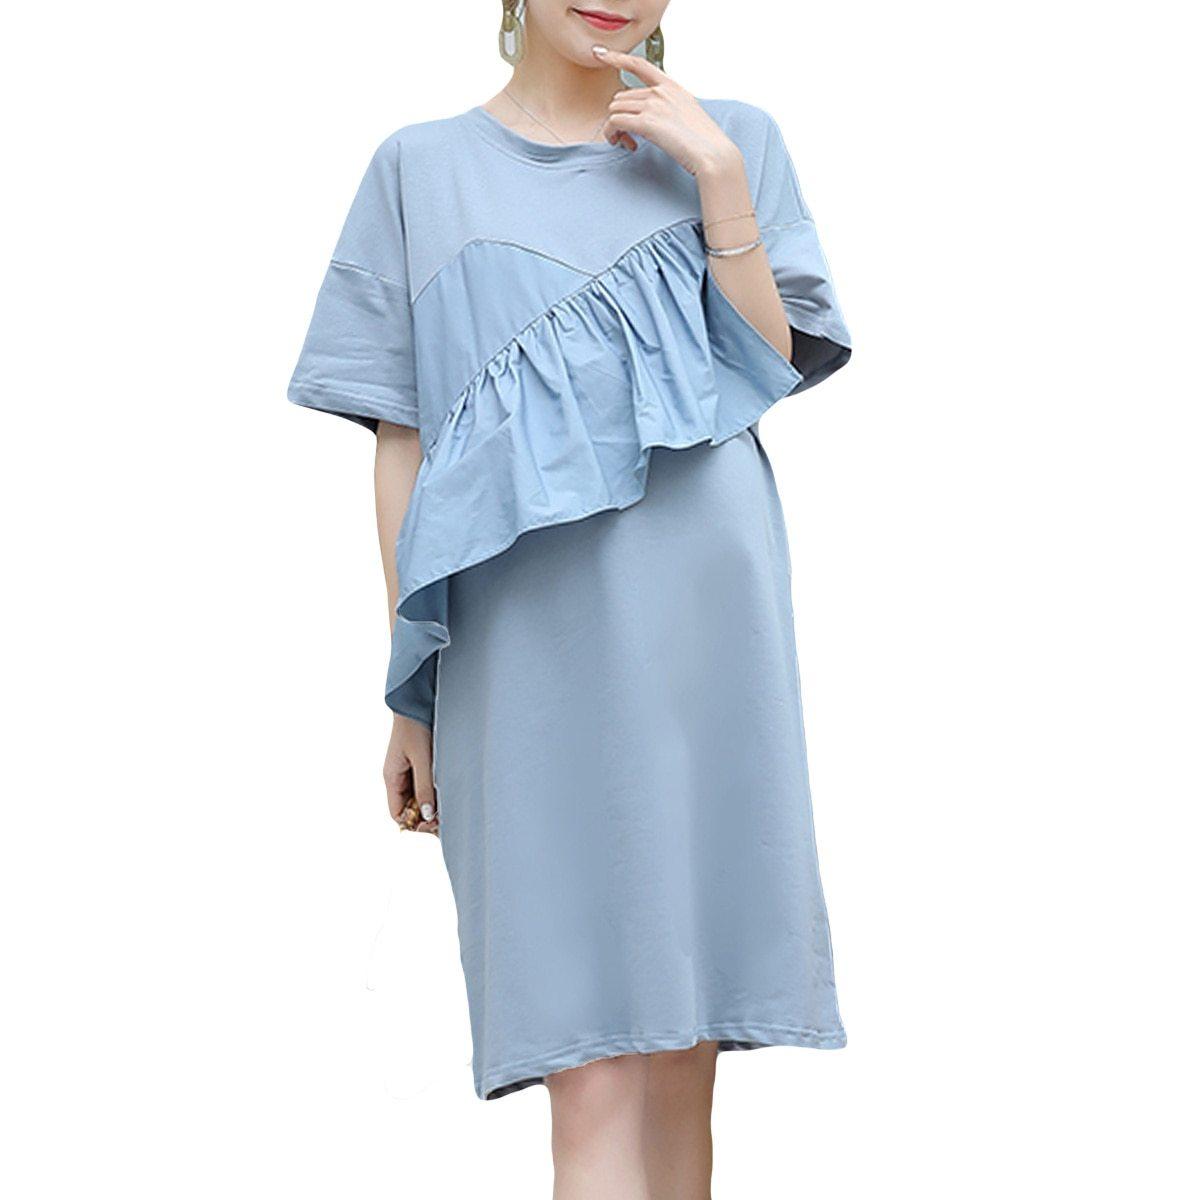 Maternity Dress Solid Color Ruffled Short Sleeve Fashion Knee Length Dress